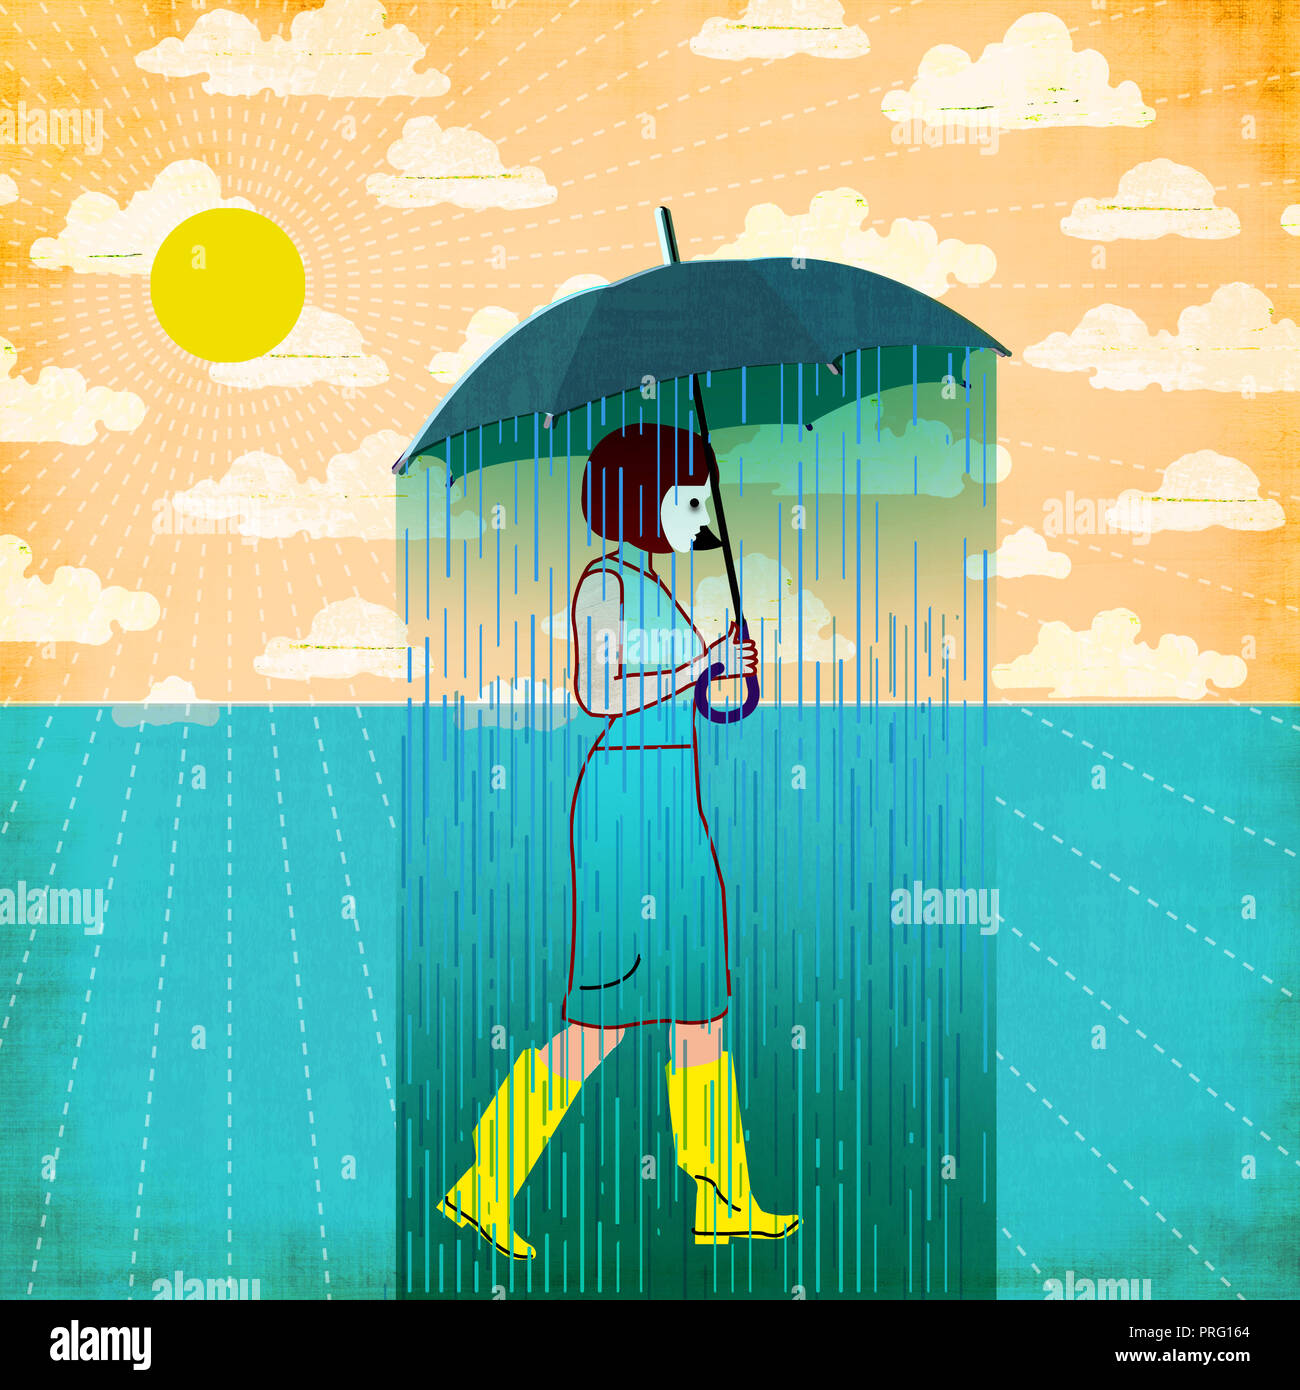 Frau mit Regenschirm Stockbild